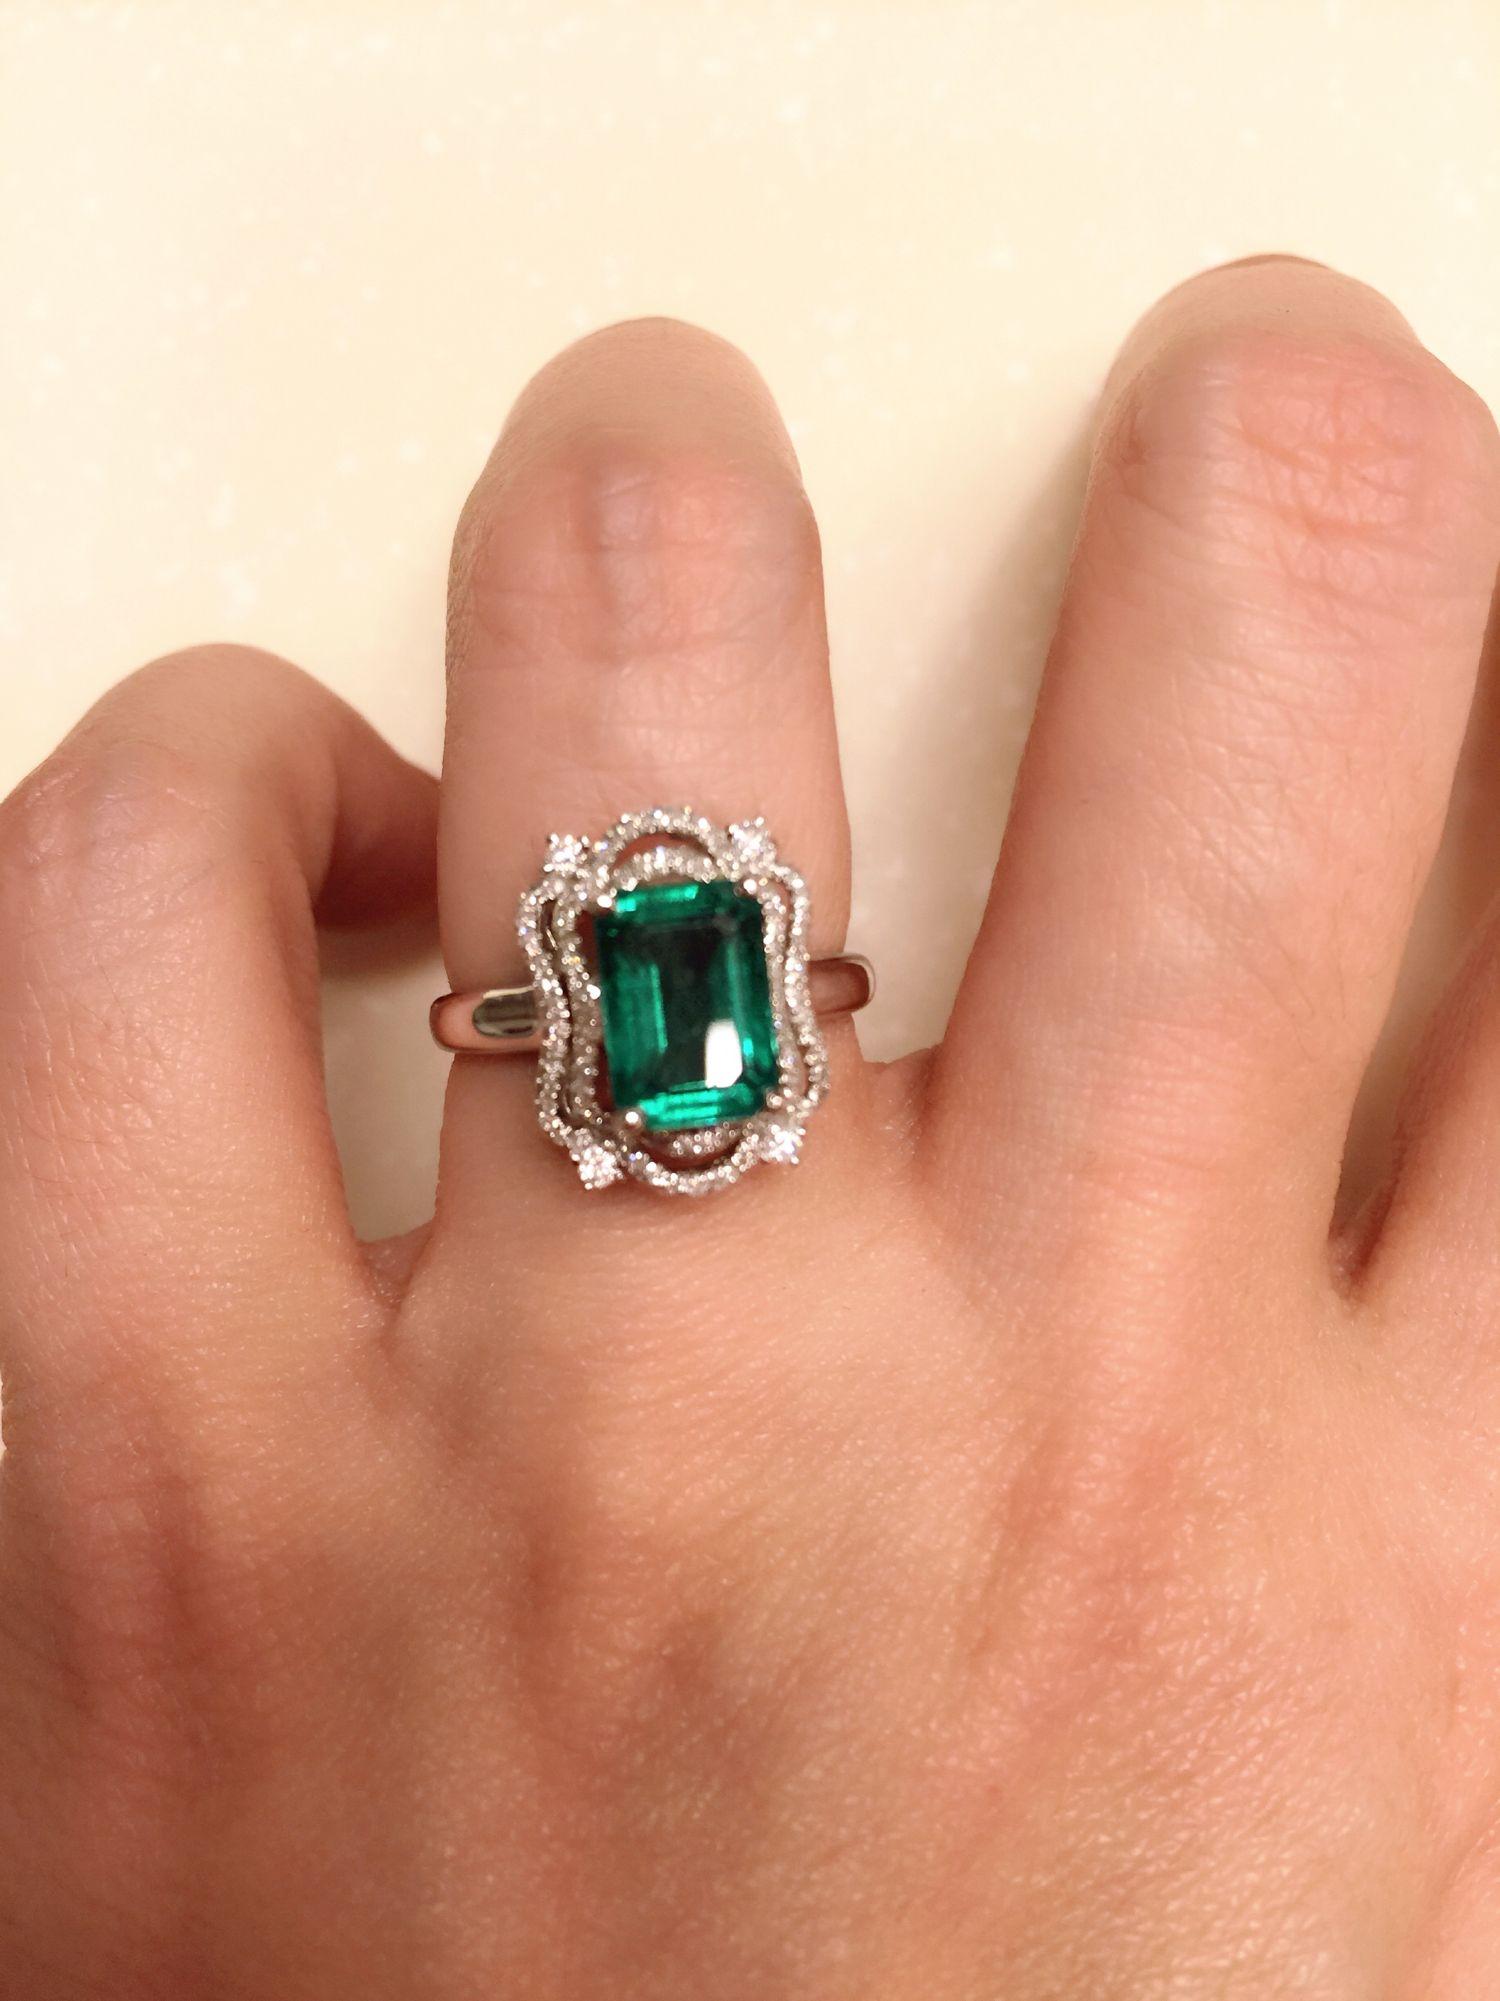 Stunning vivid green emerald and diamond ring jewellery